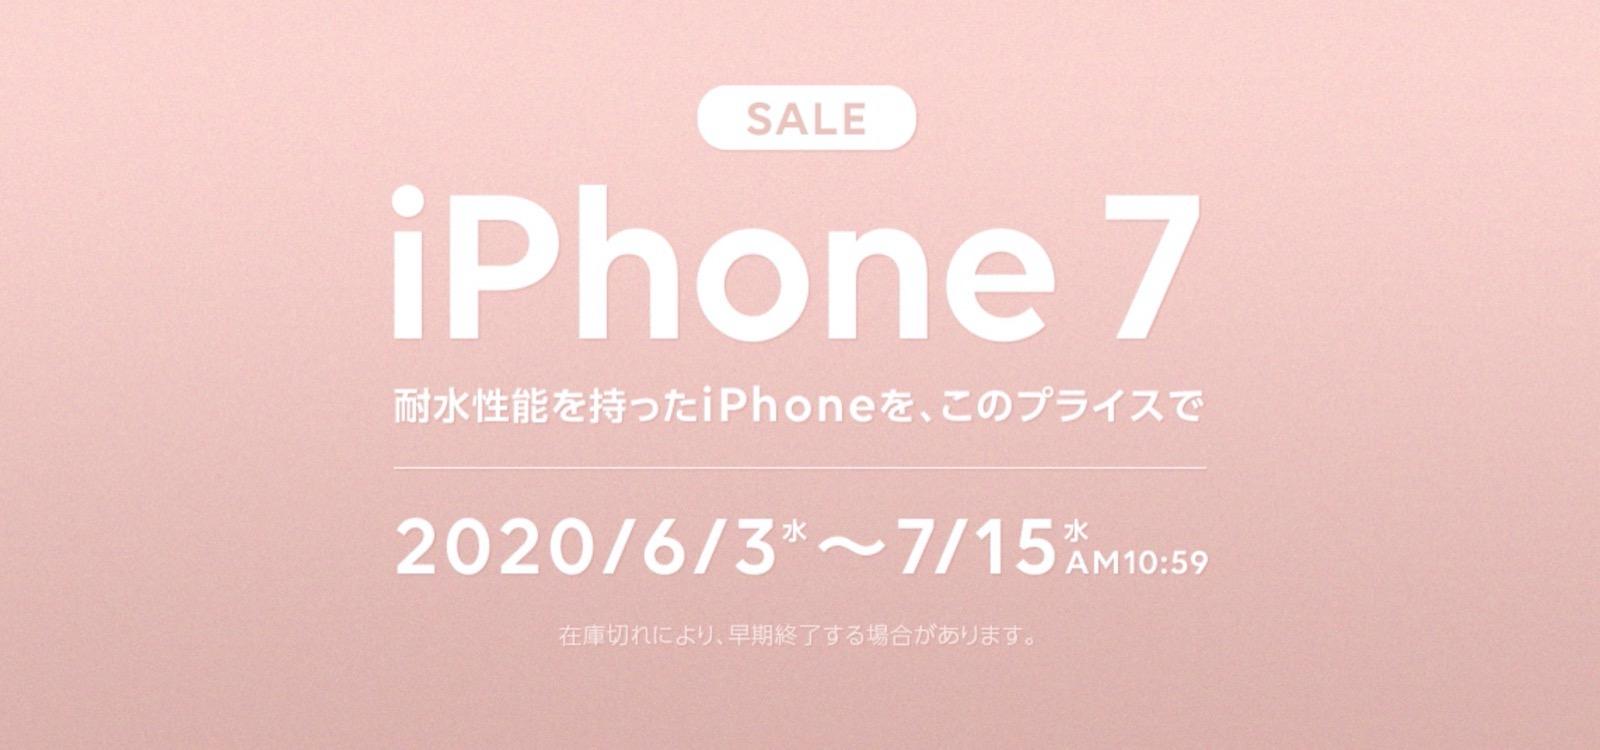 Line mobile sale